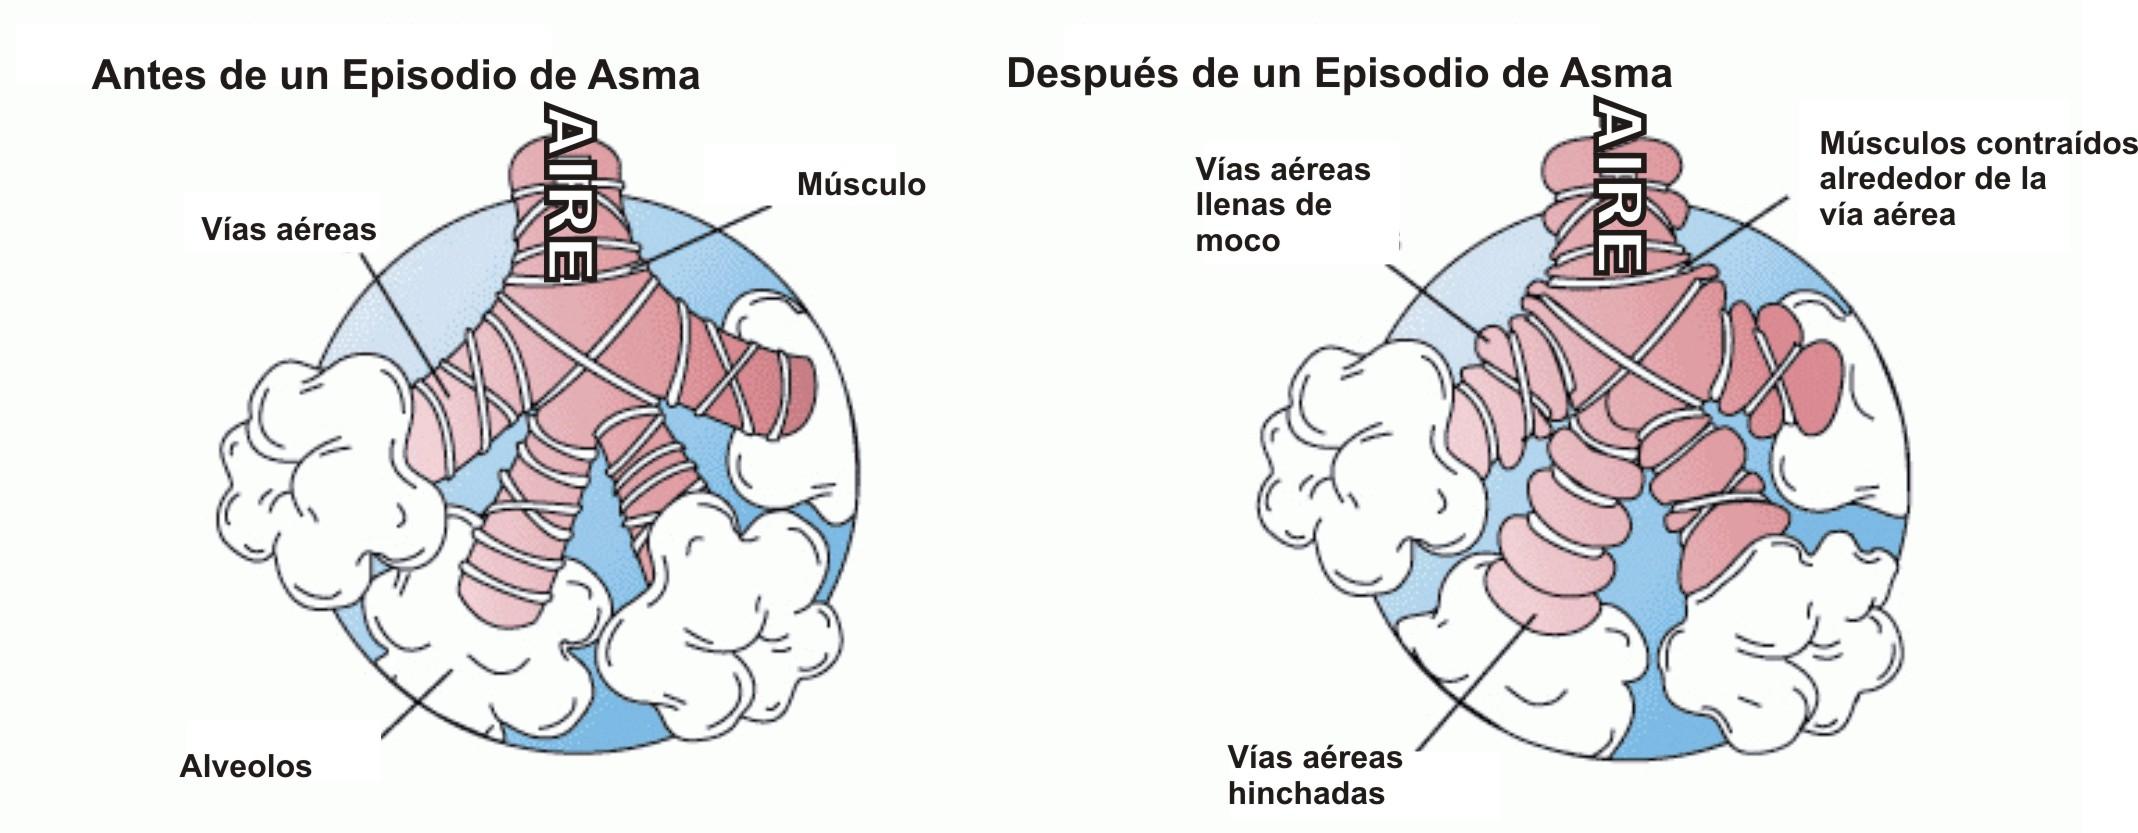 Asma - Wikipedia